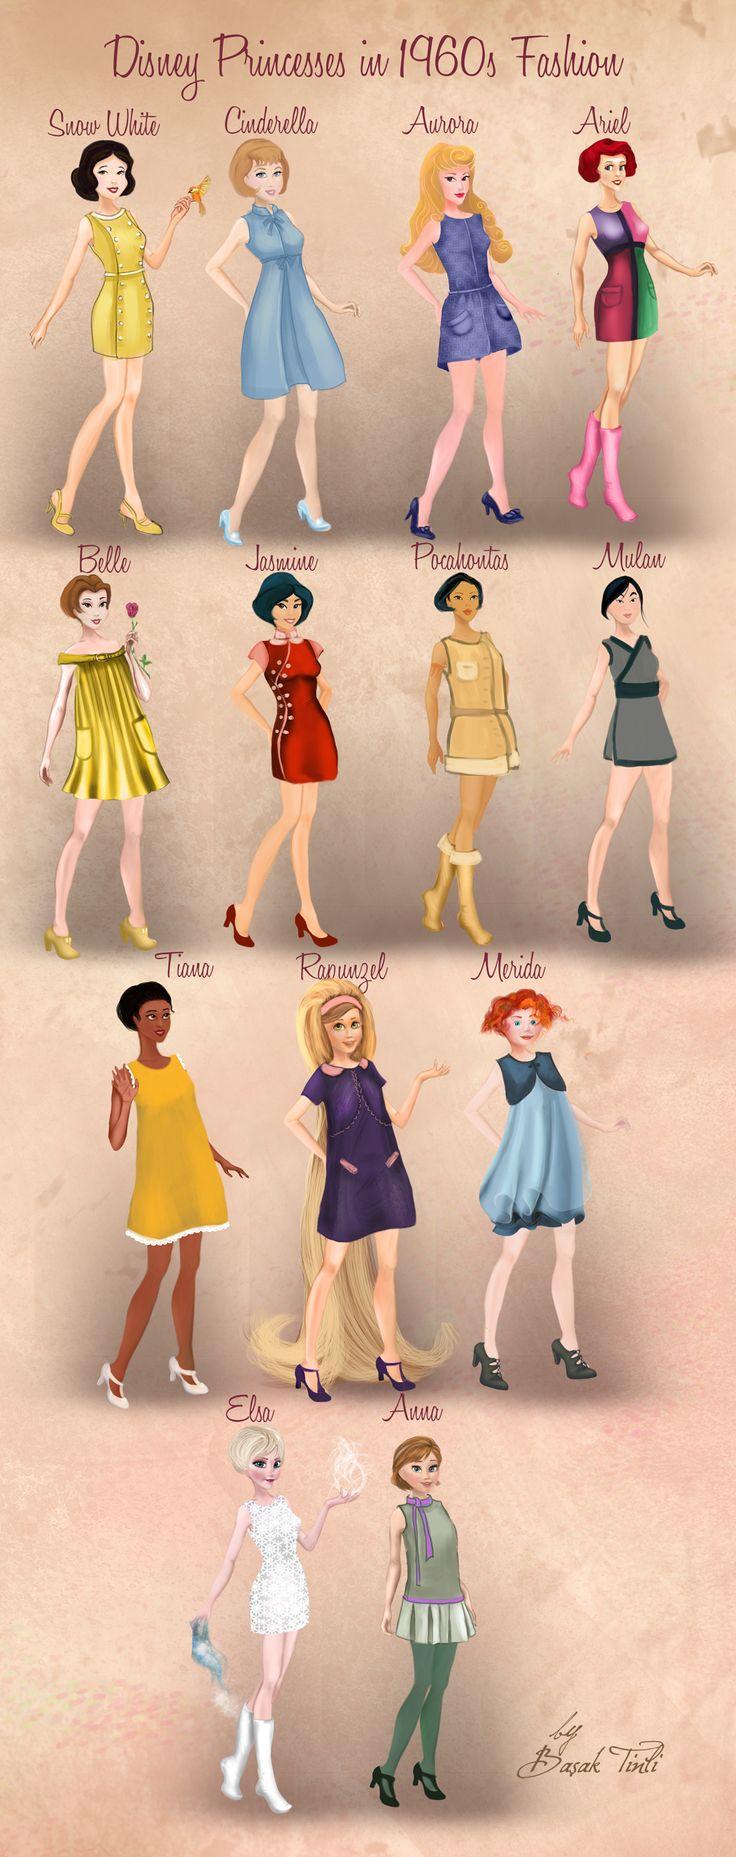 Disney Princesses in 1960s Fashion by Basak Tinli by BasakTinli.deviantart.com on @DeviantArt